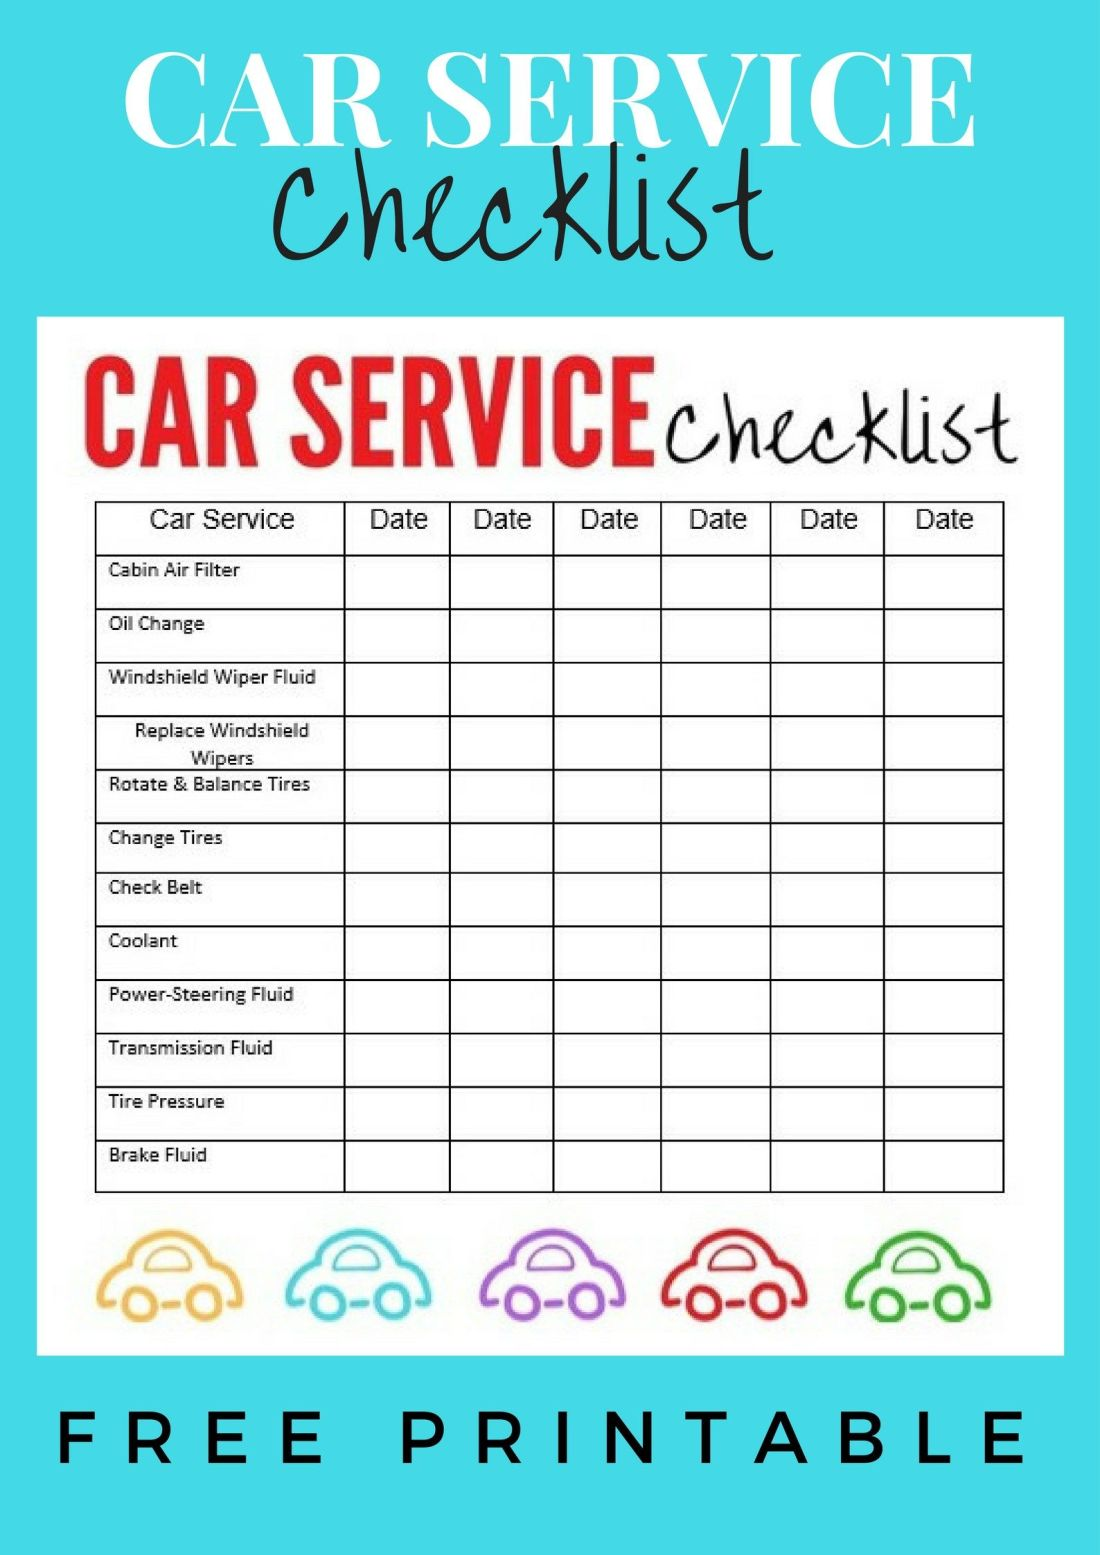 Car service checklist mini vans gloves and organizing